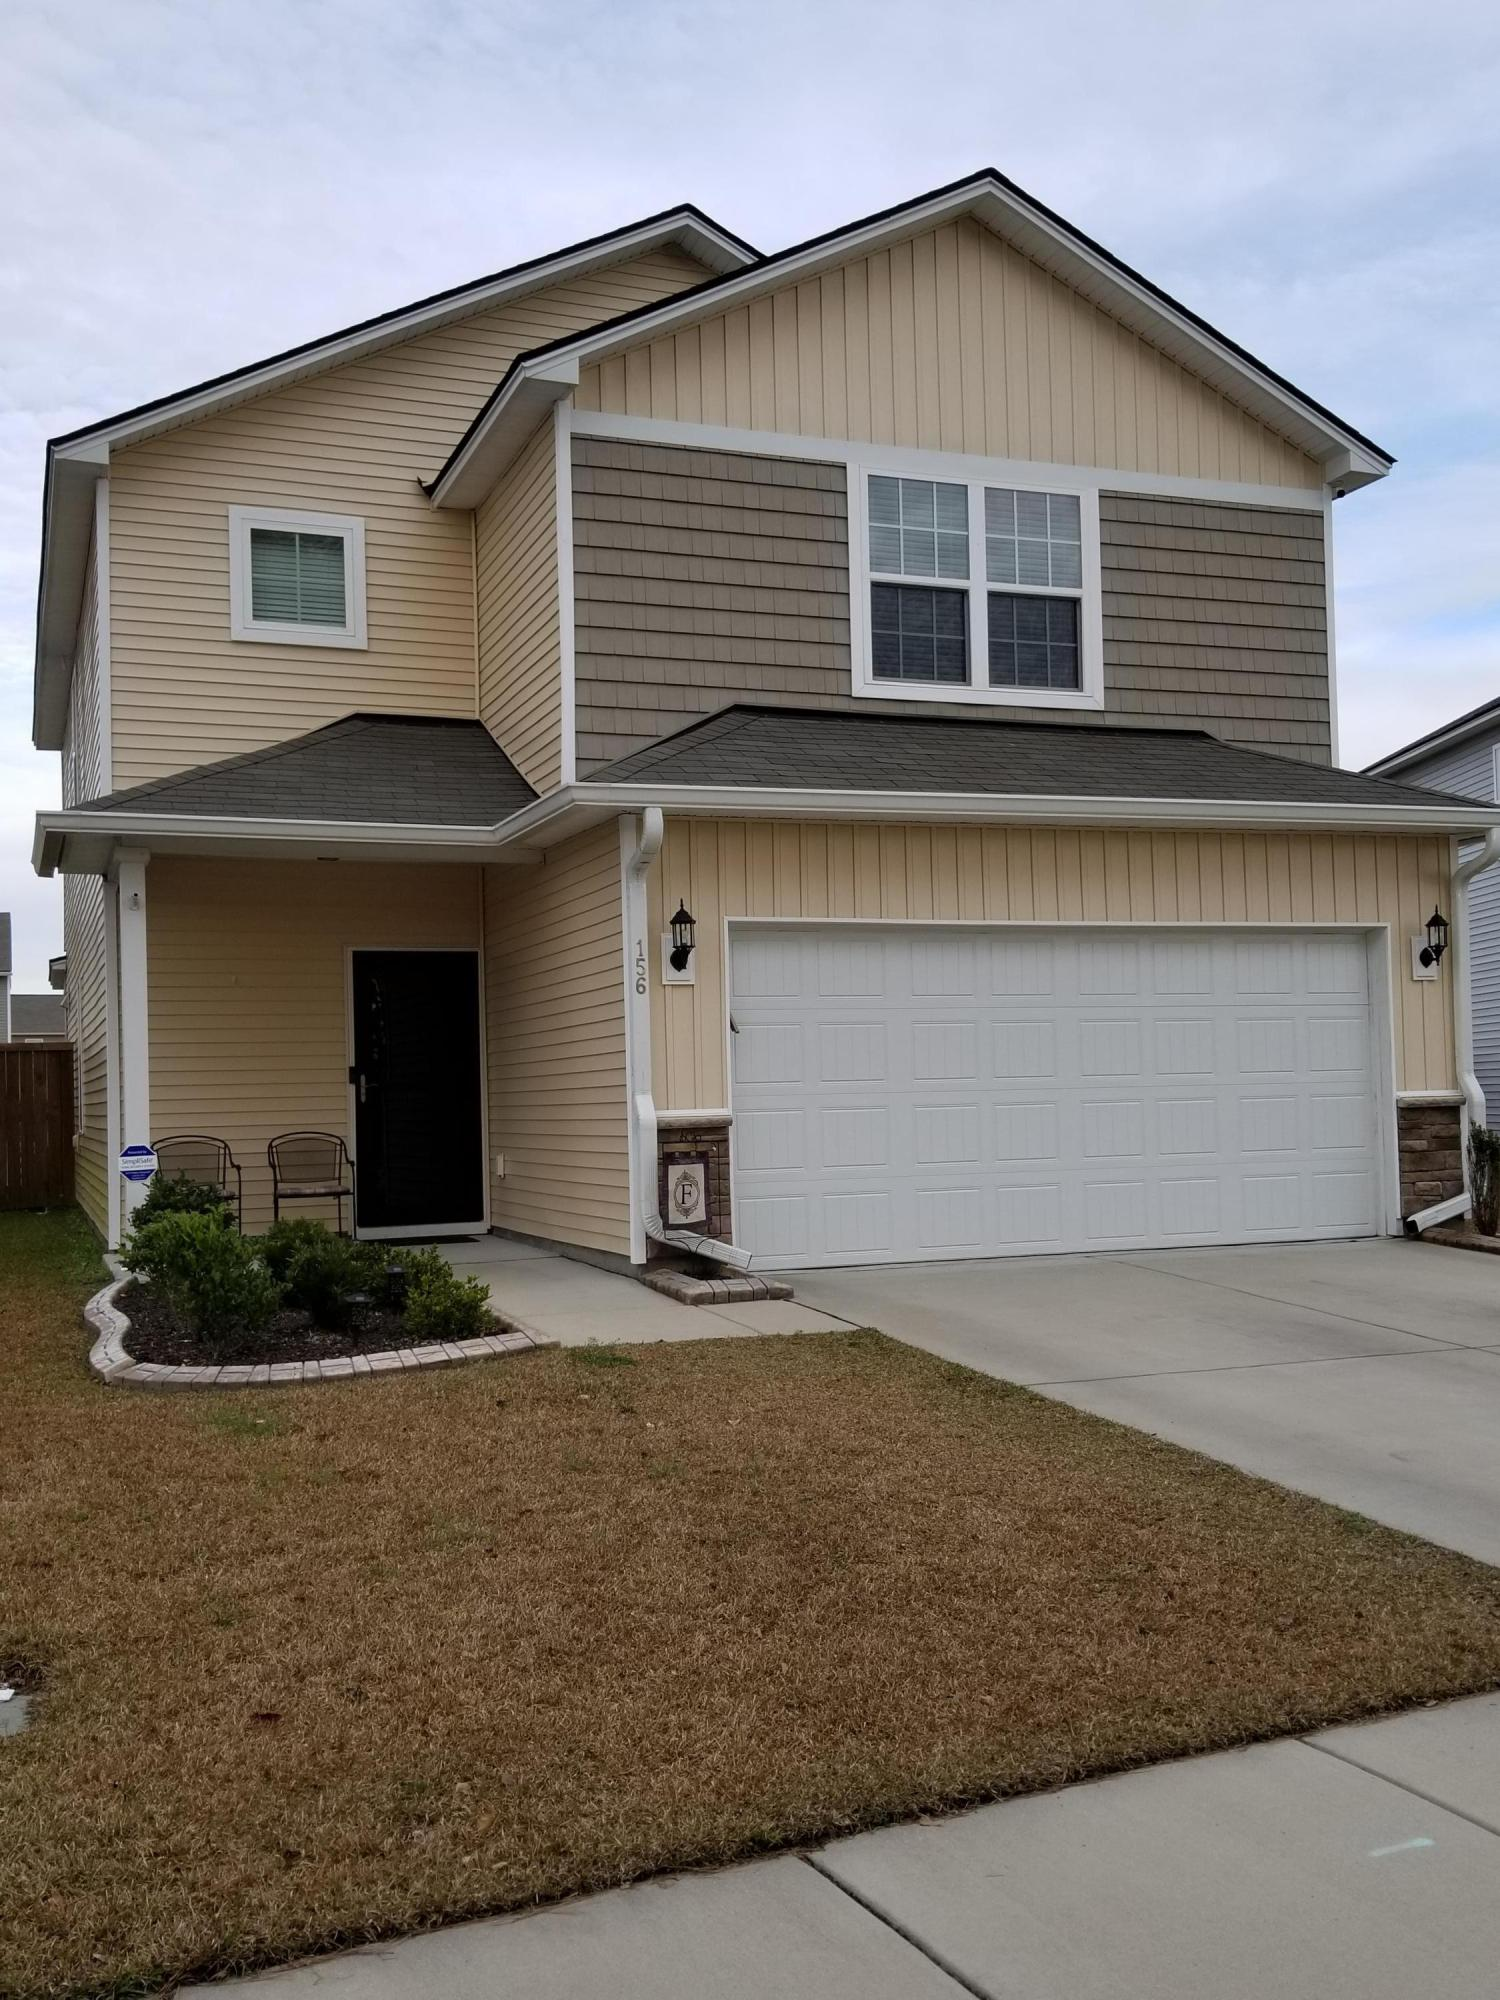 Cane Bay Plantation Homes For Sale - 156 Brookhaven, Summerville, SC - 0